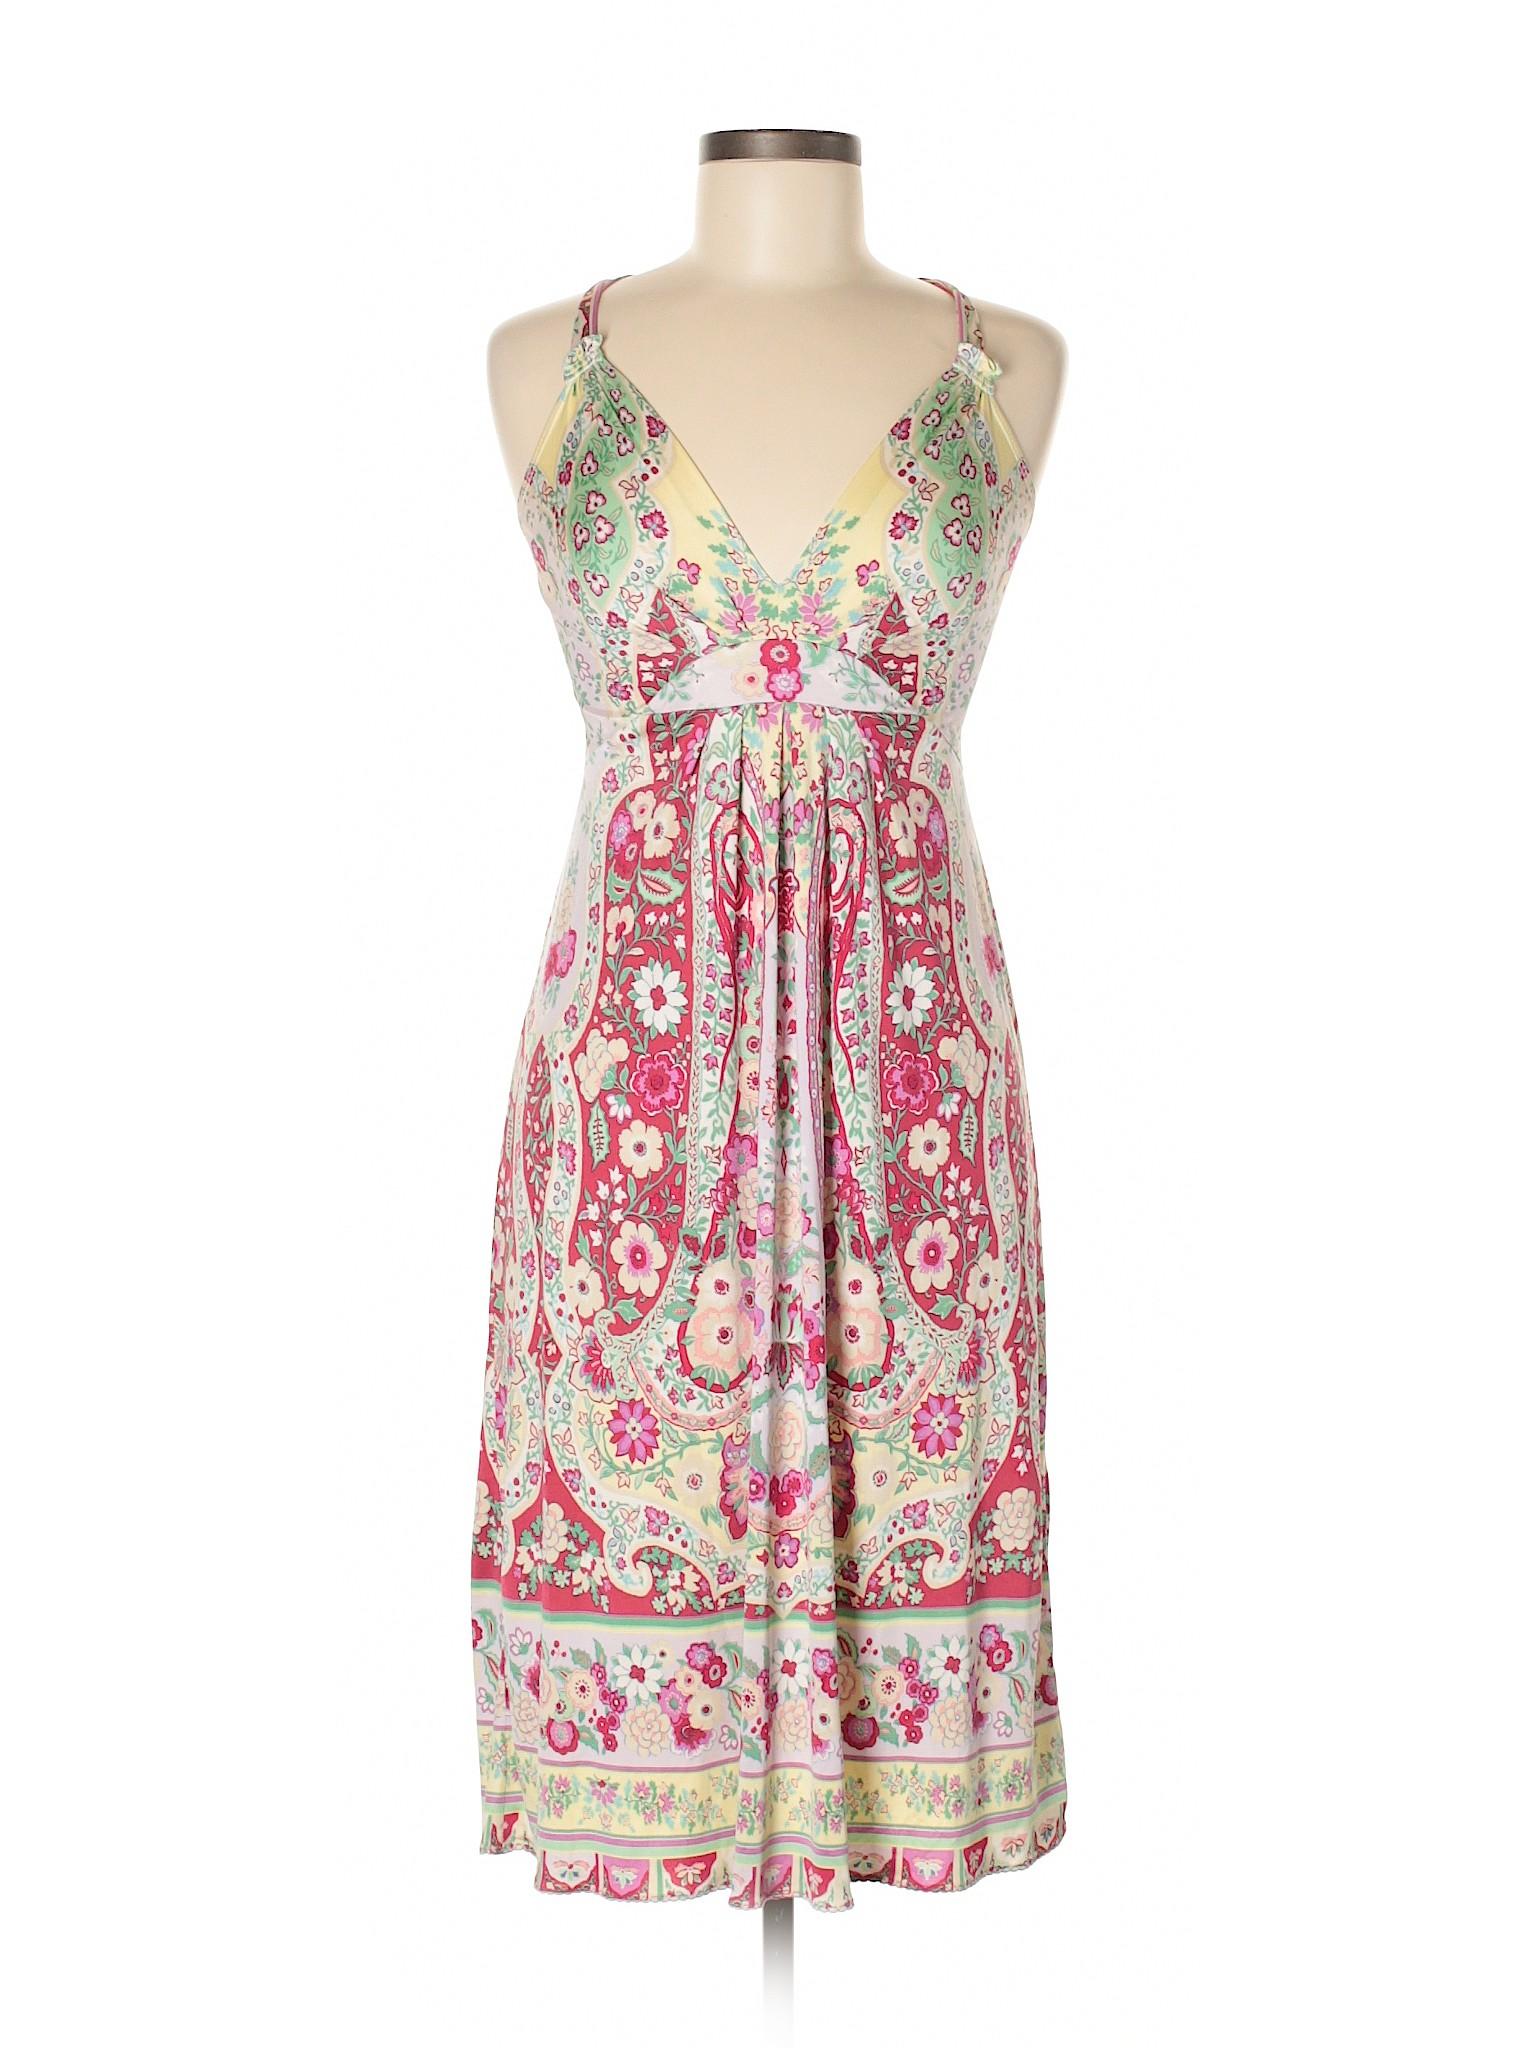 Tahari Boutique Elie Dress Casual winter 1x6qAxwEH